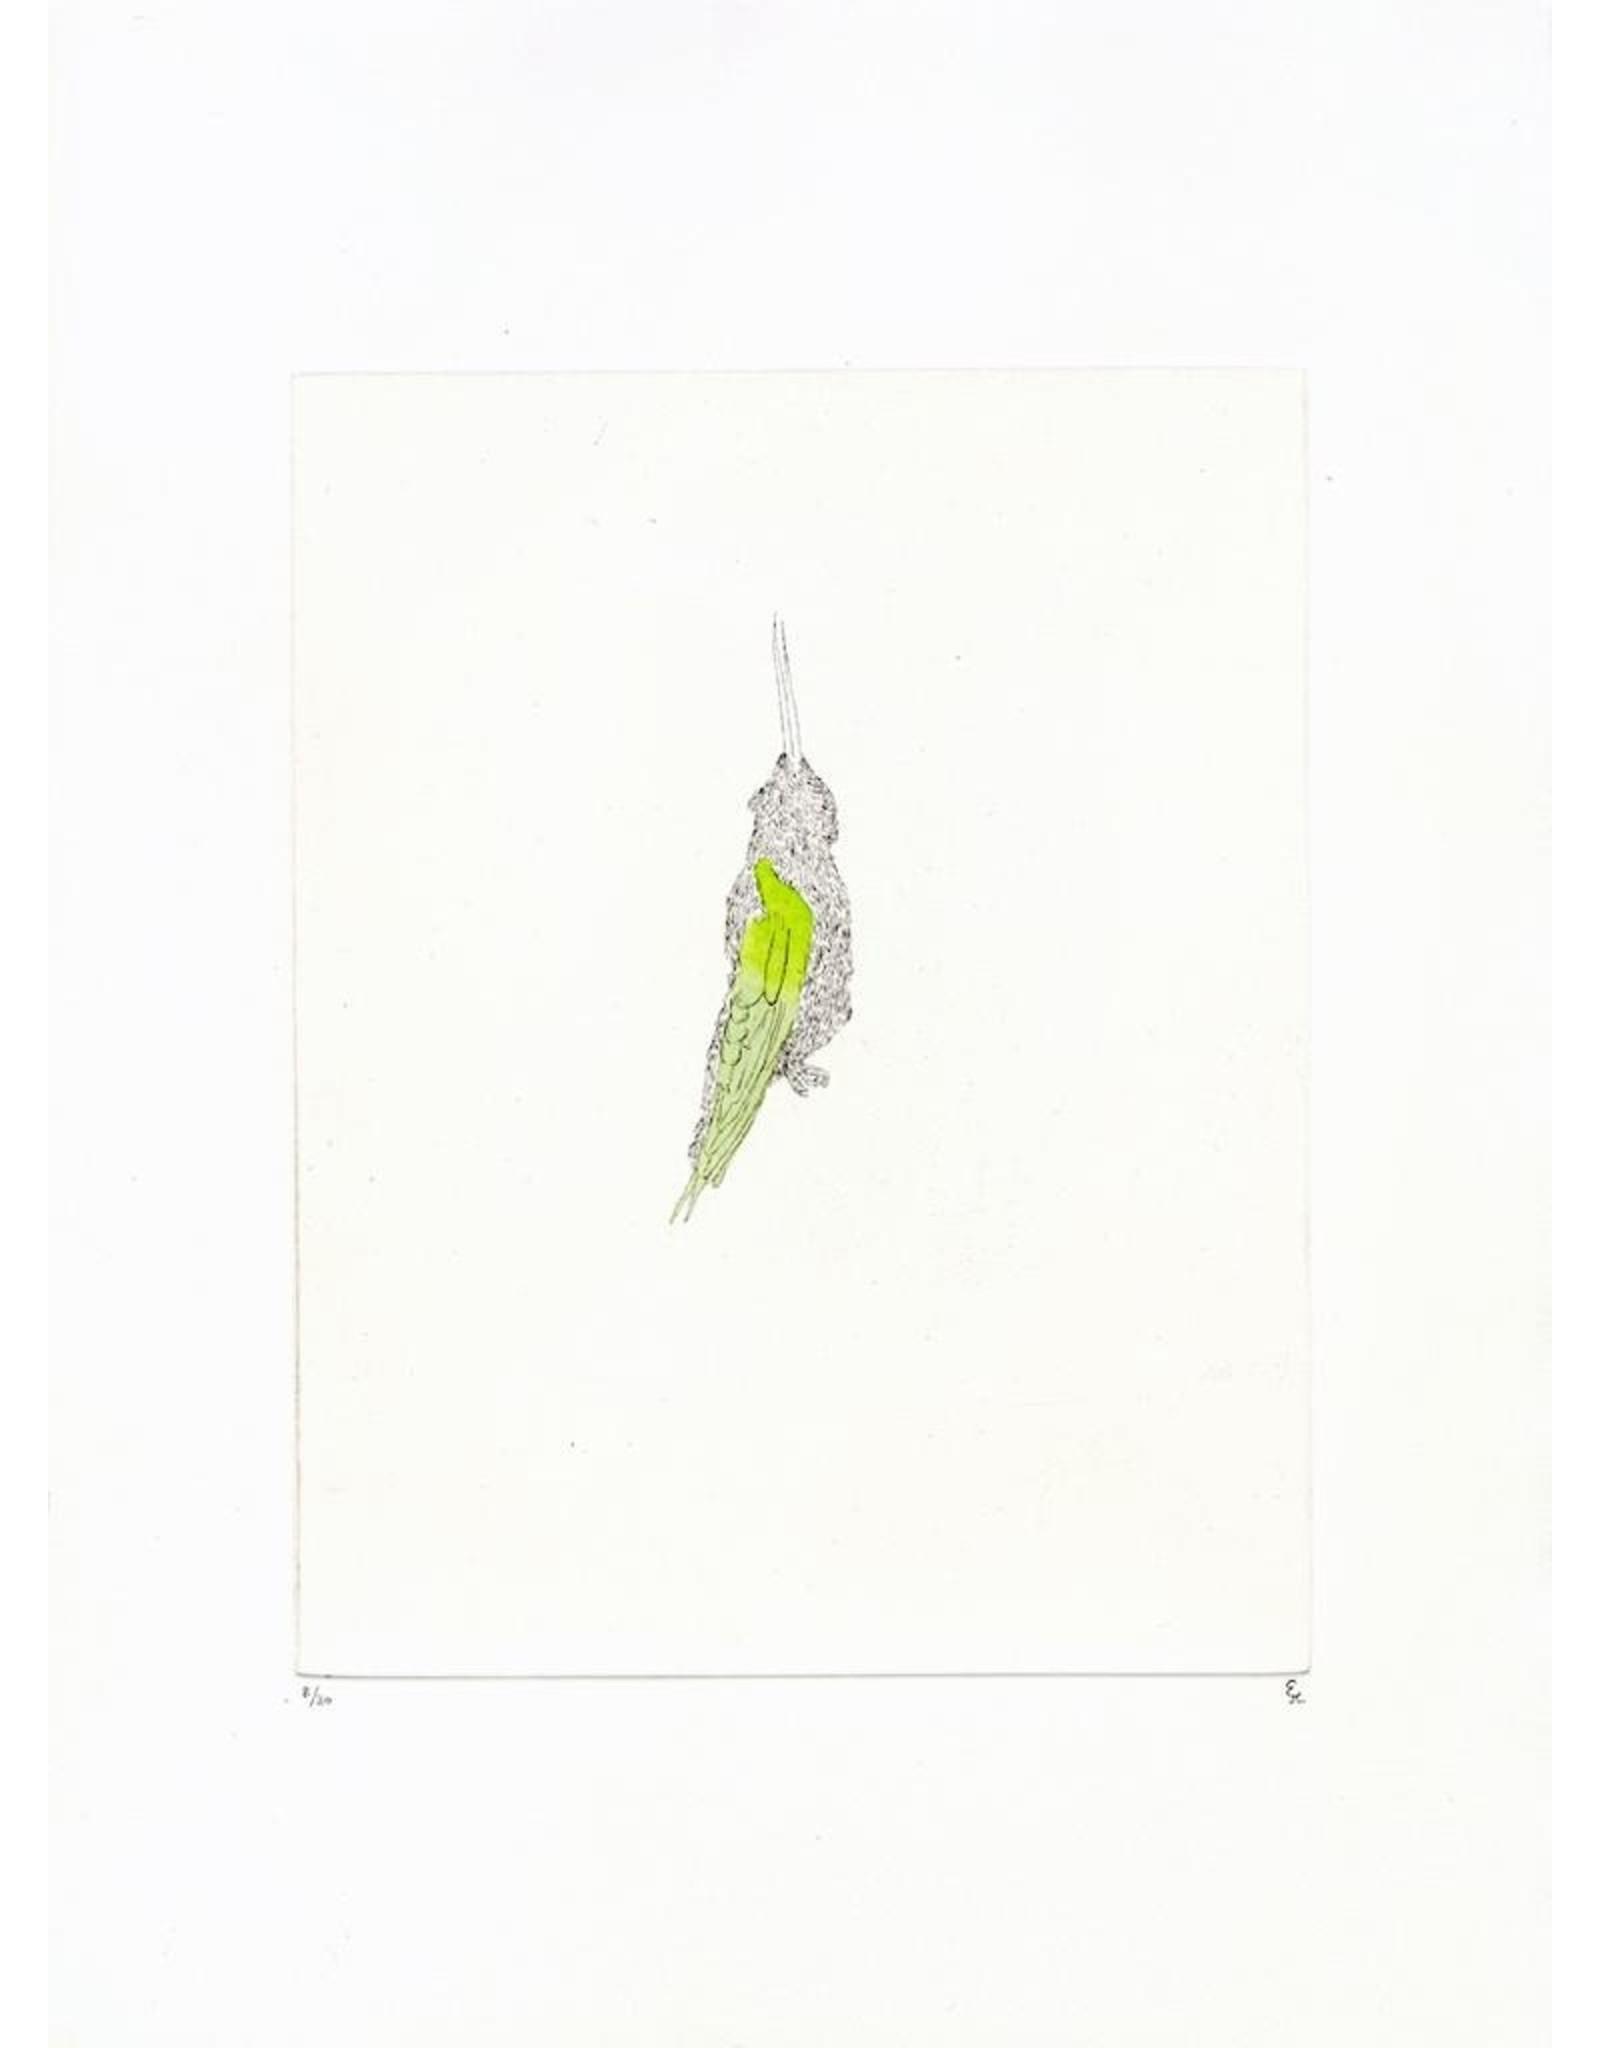 Josephson-Laidlaw, Erin Hummingbird, (from Some Specimens series), Erin Josephson-Laidlaw